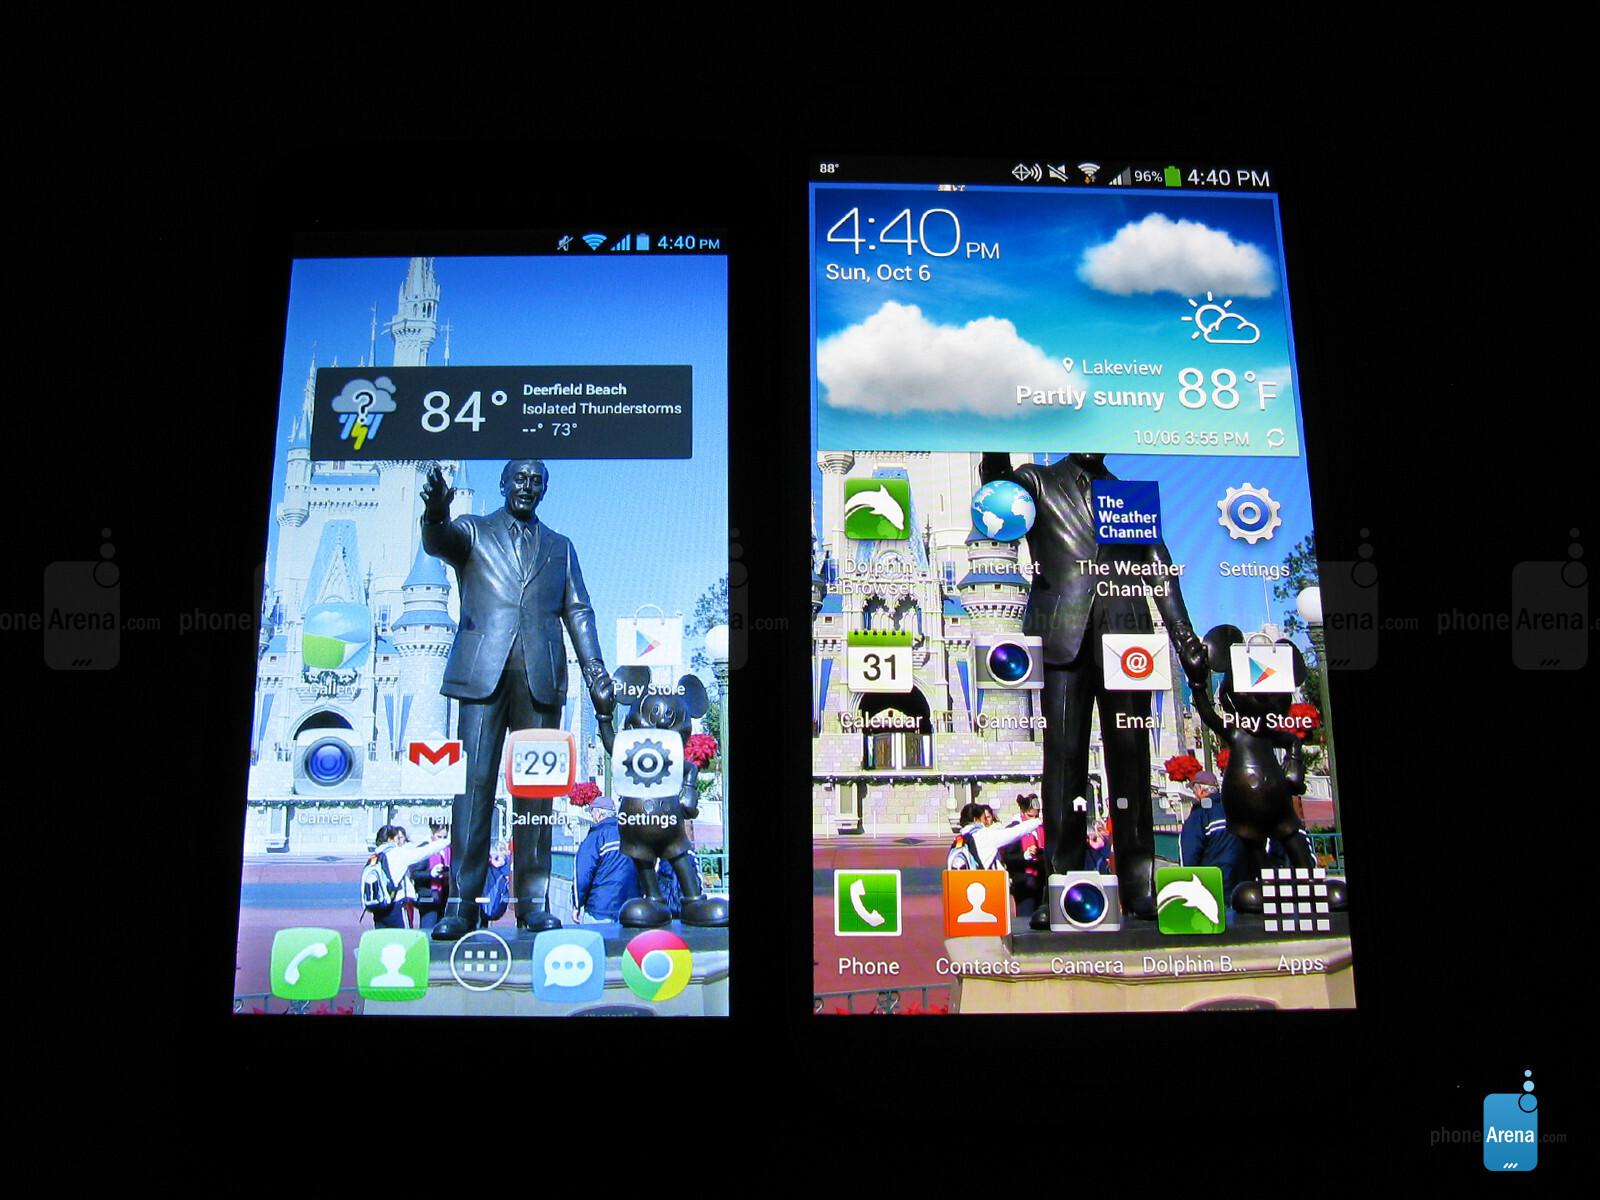 The Fierce Display Next To Galaxy S4